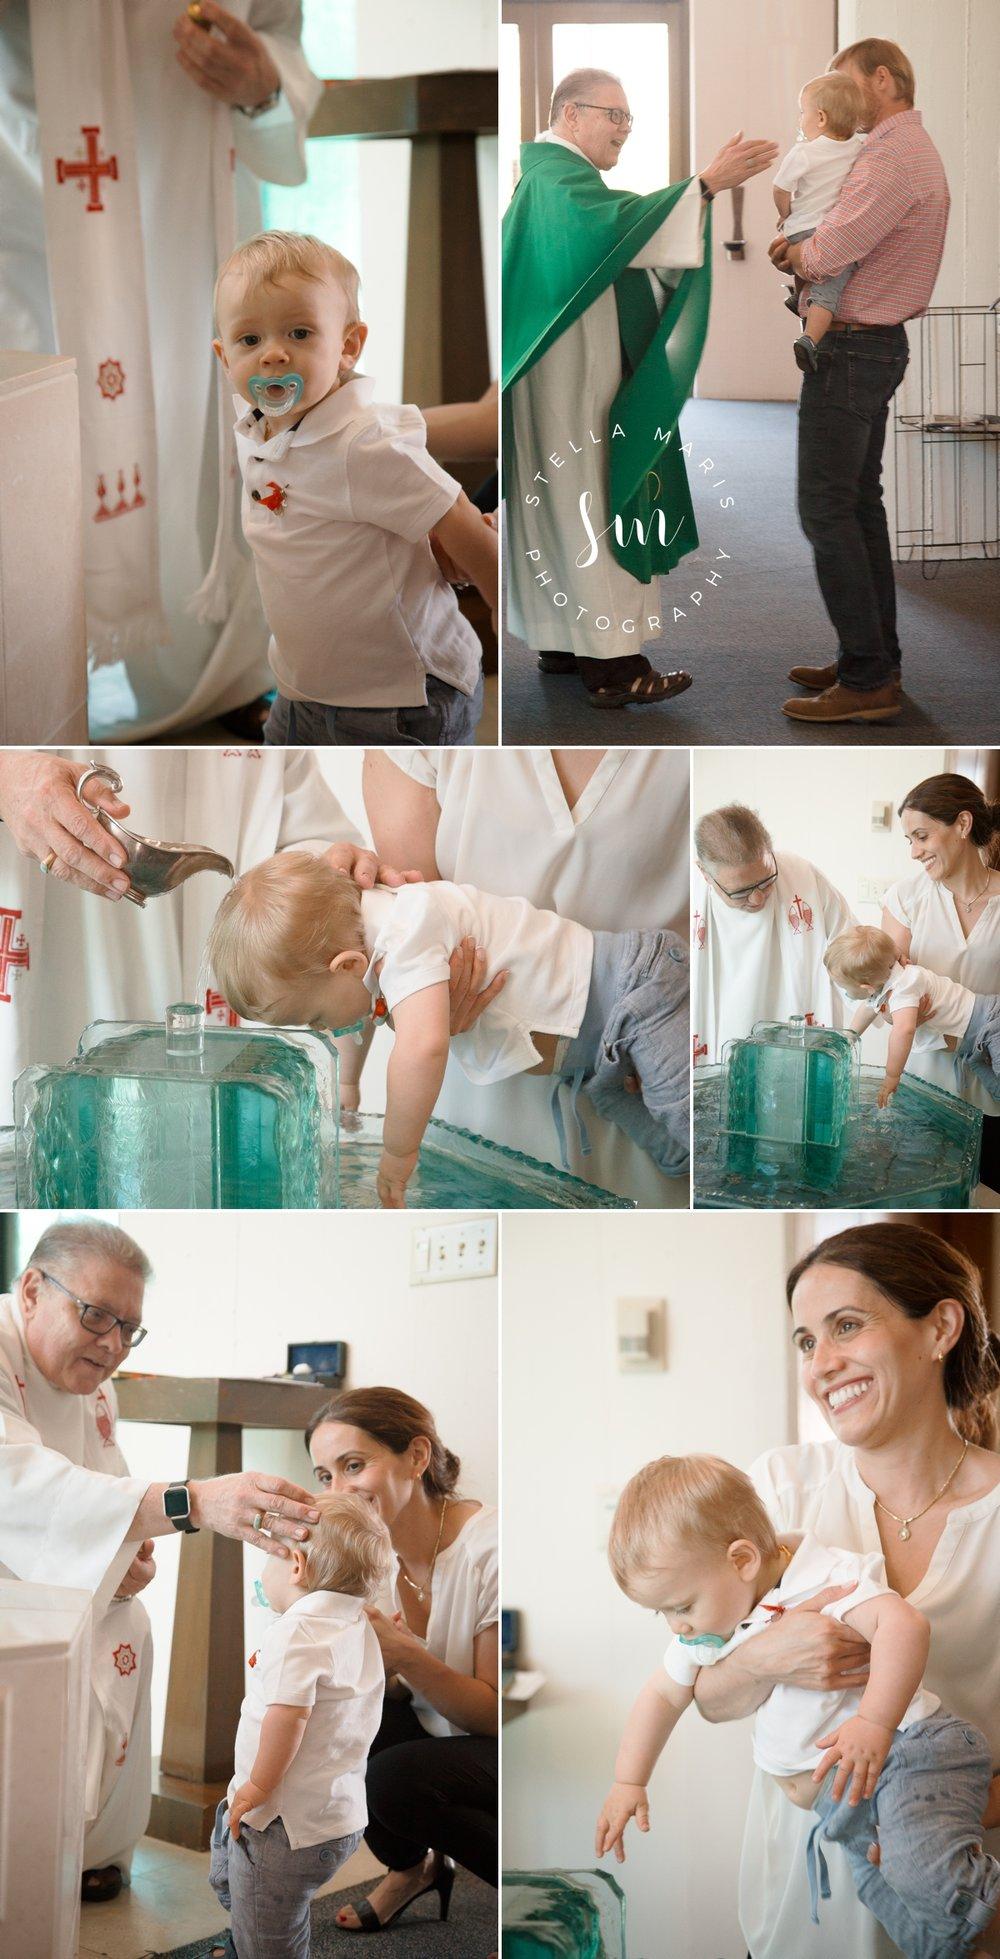 Nicco's Baptism